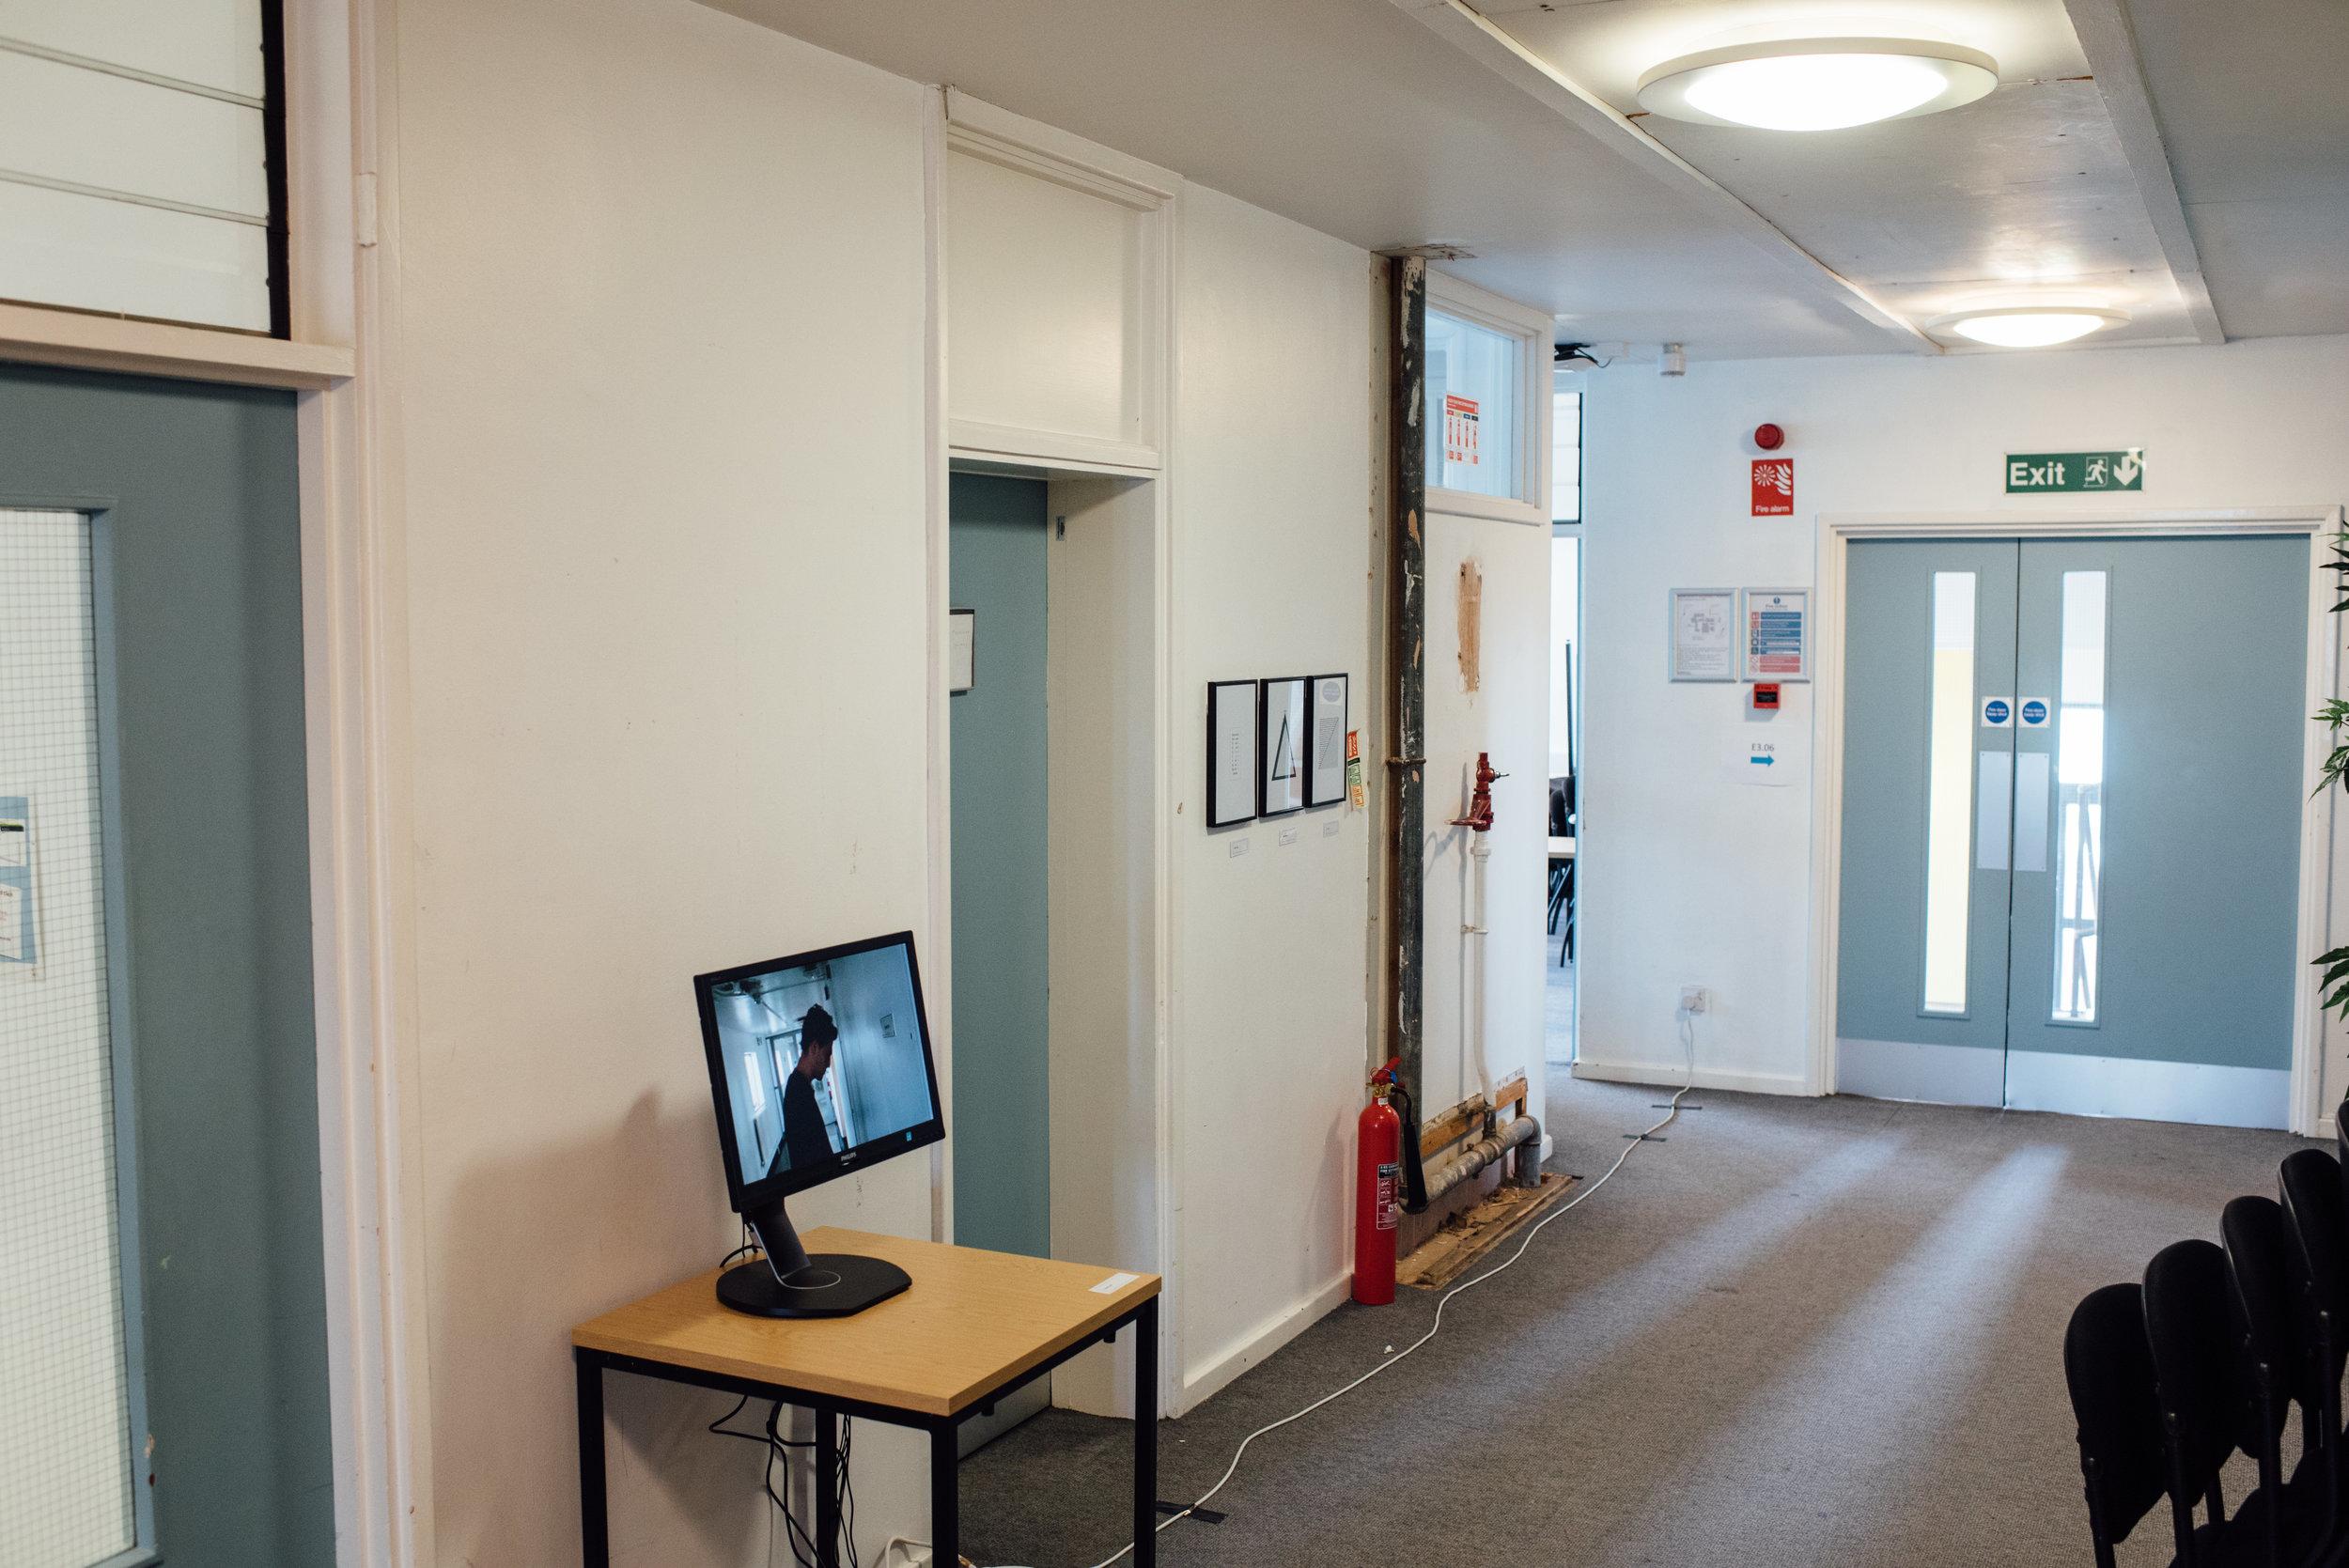 Installation Shot (1) - Corridor